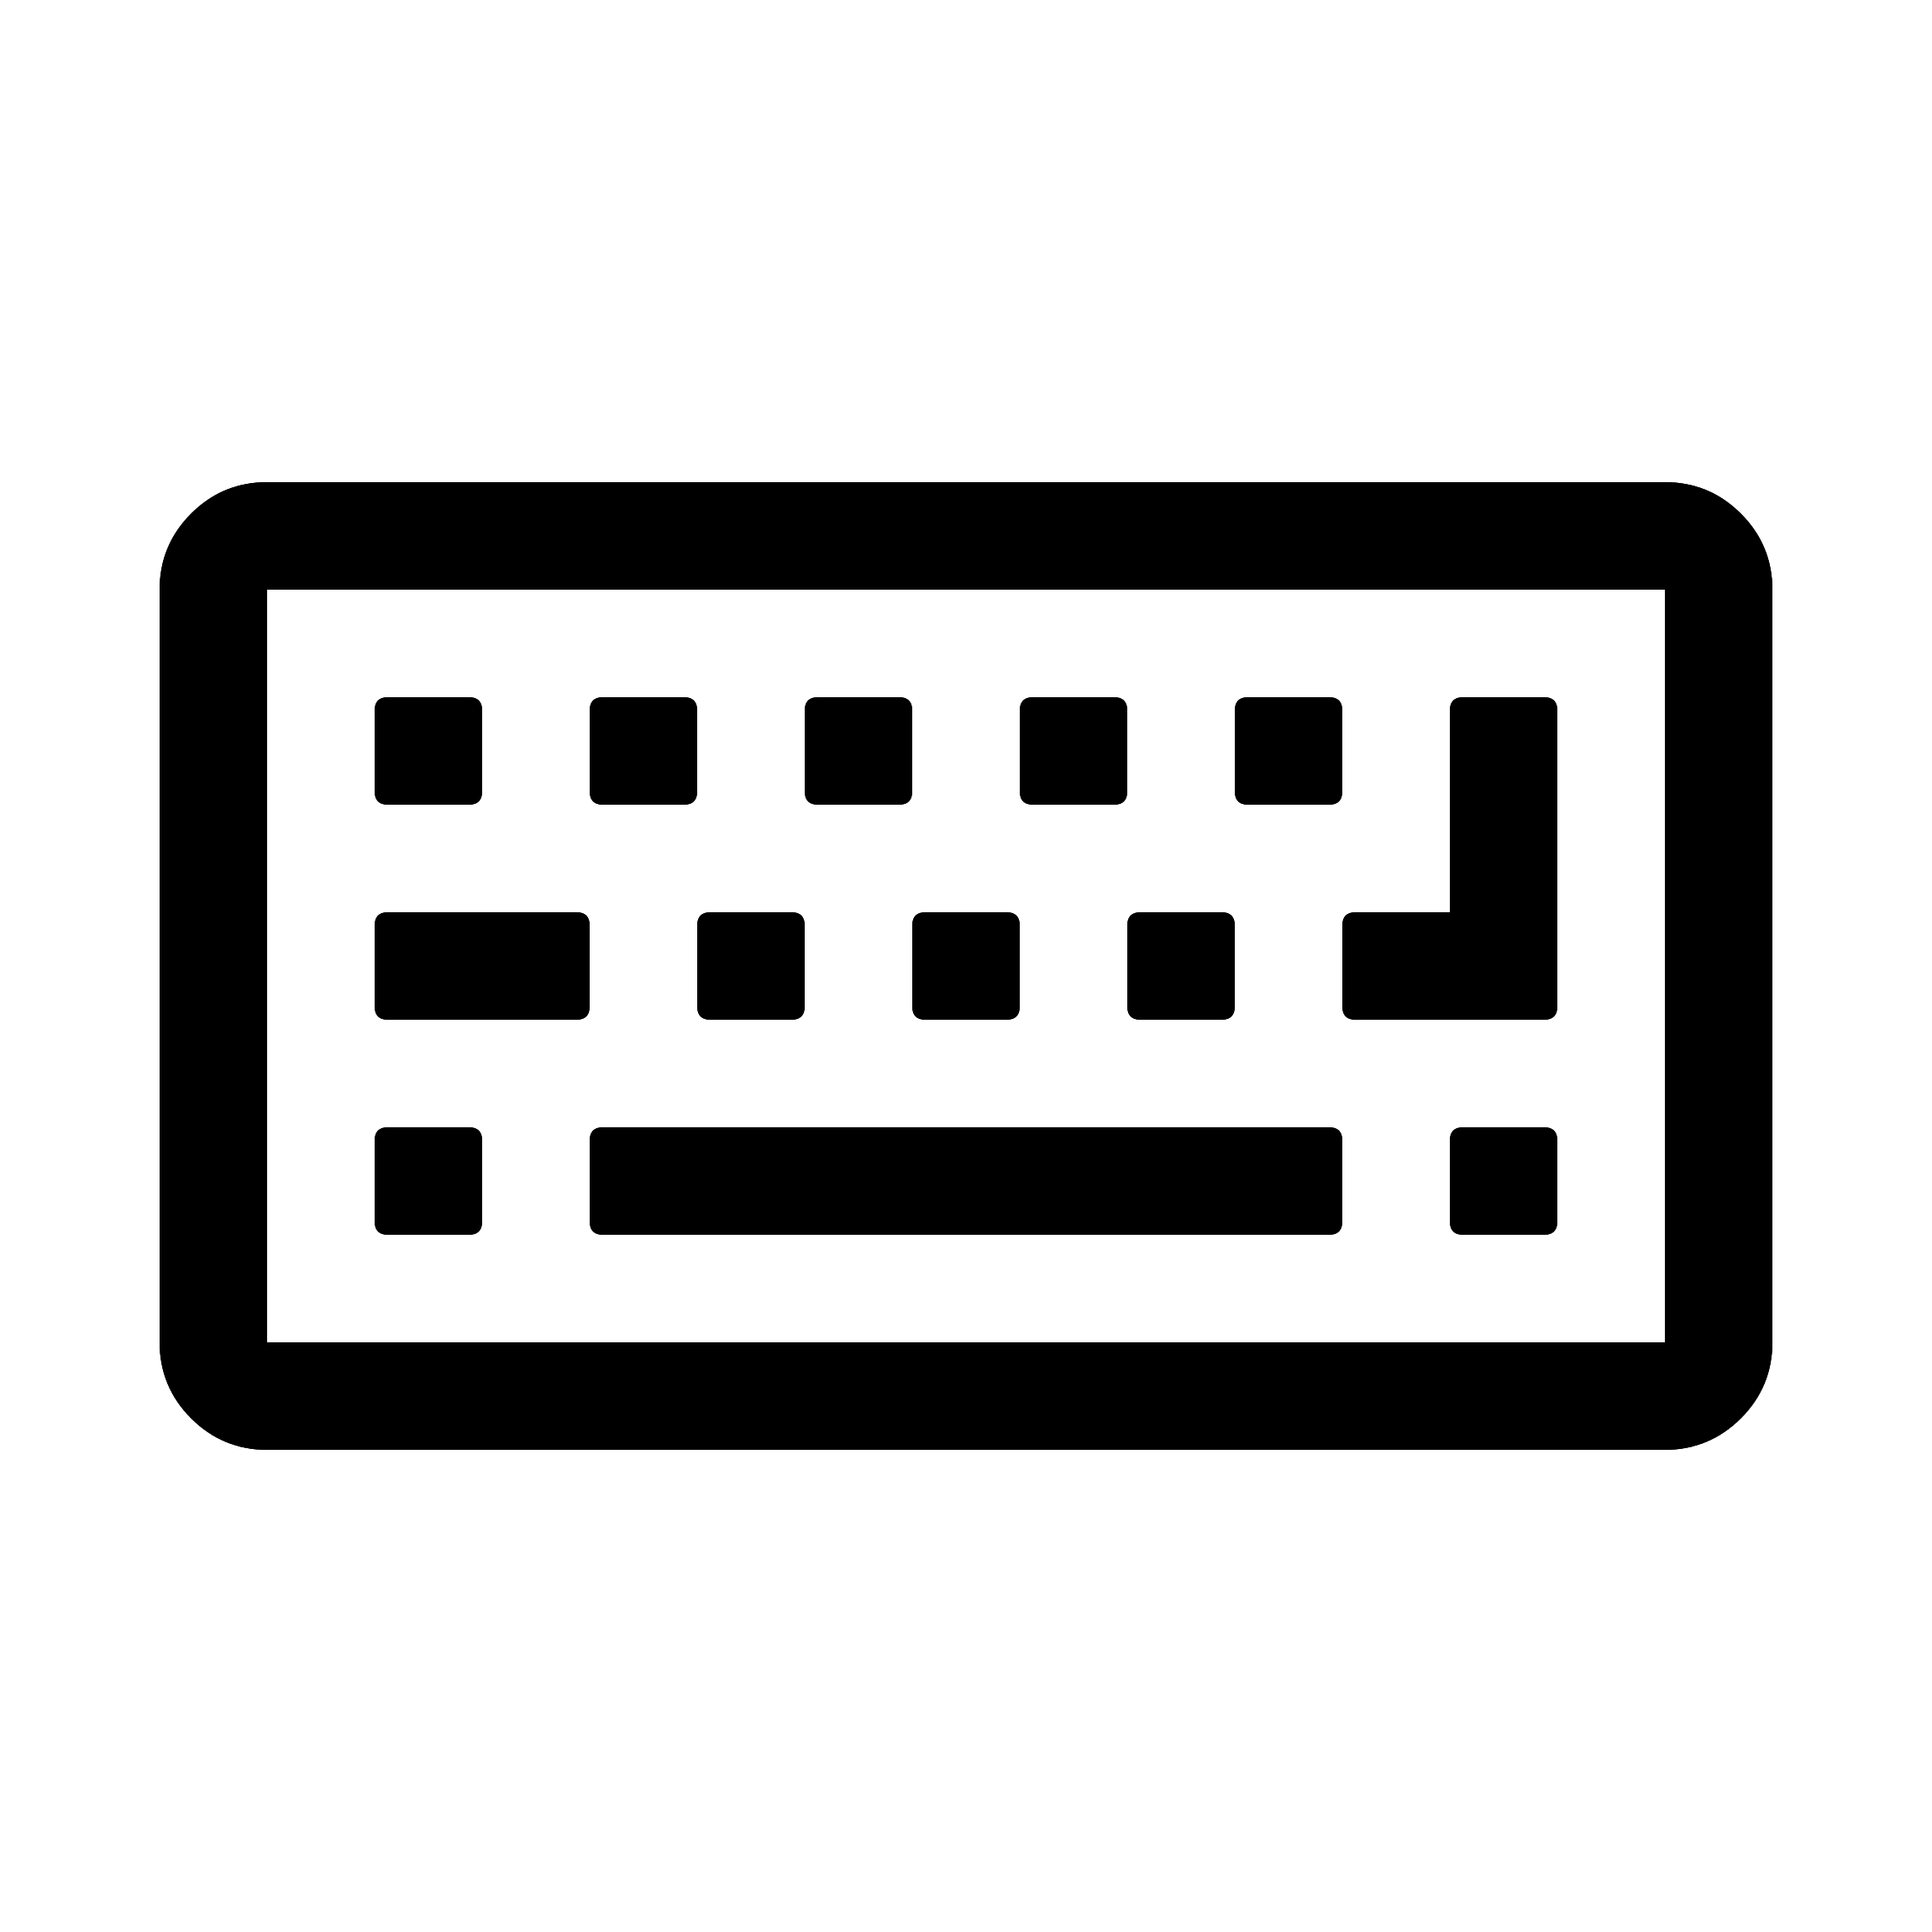 data/images/keyboard-o.png